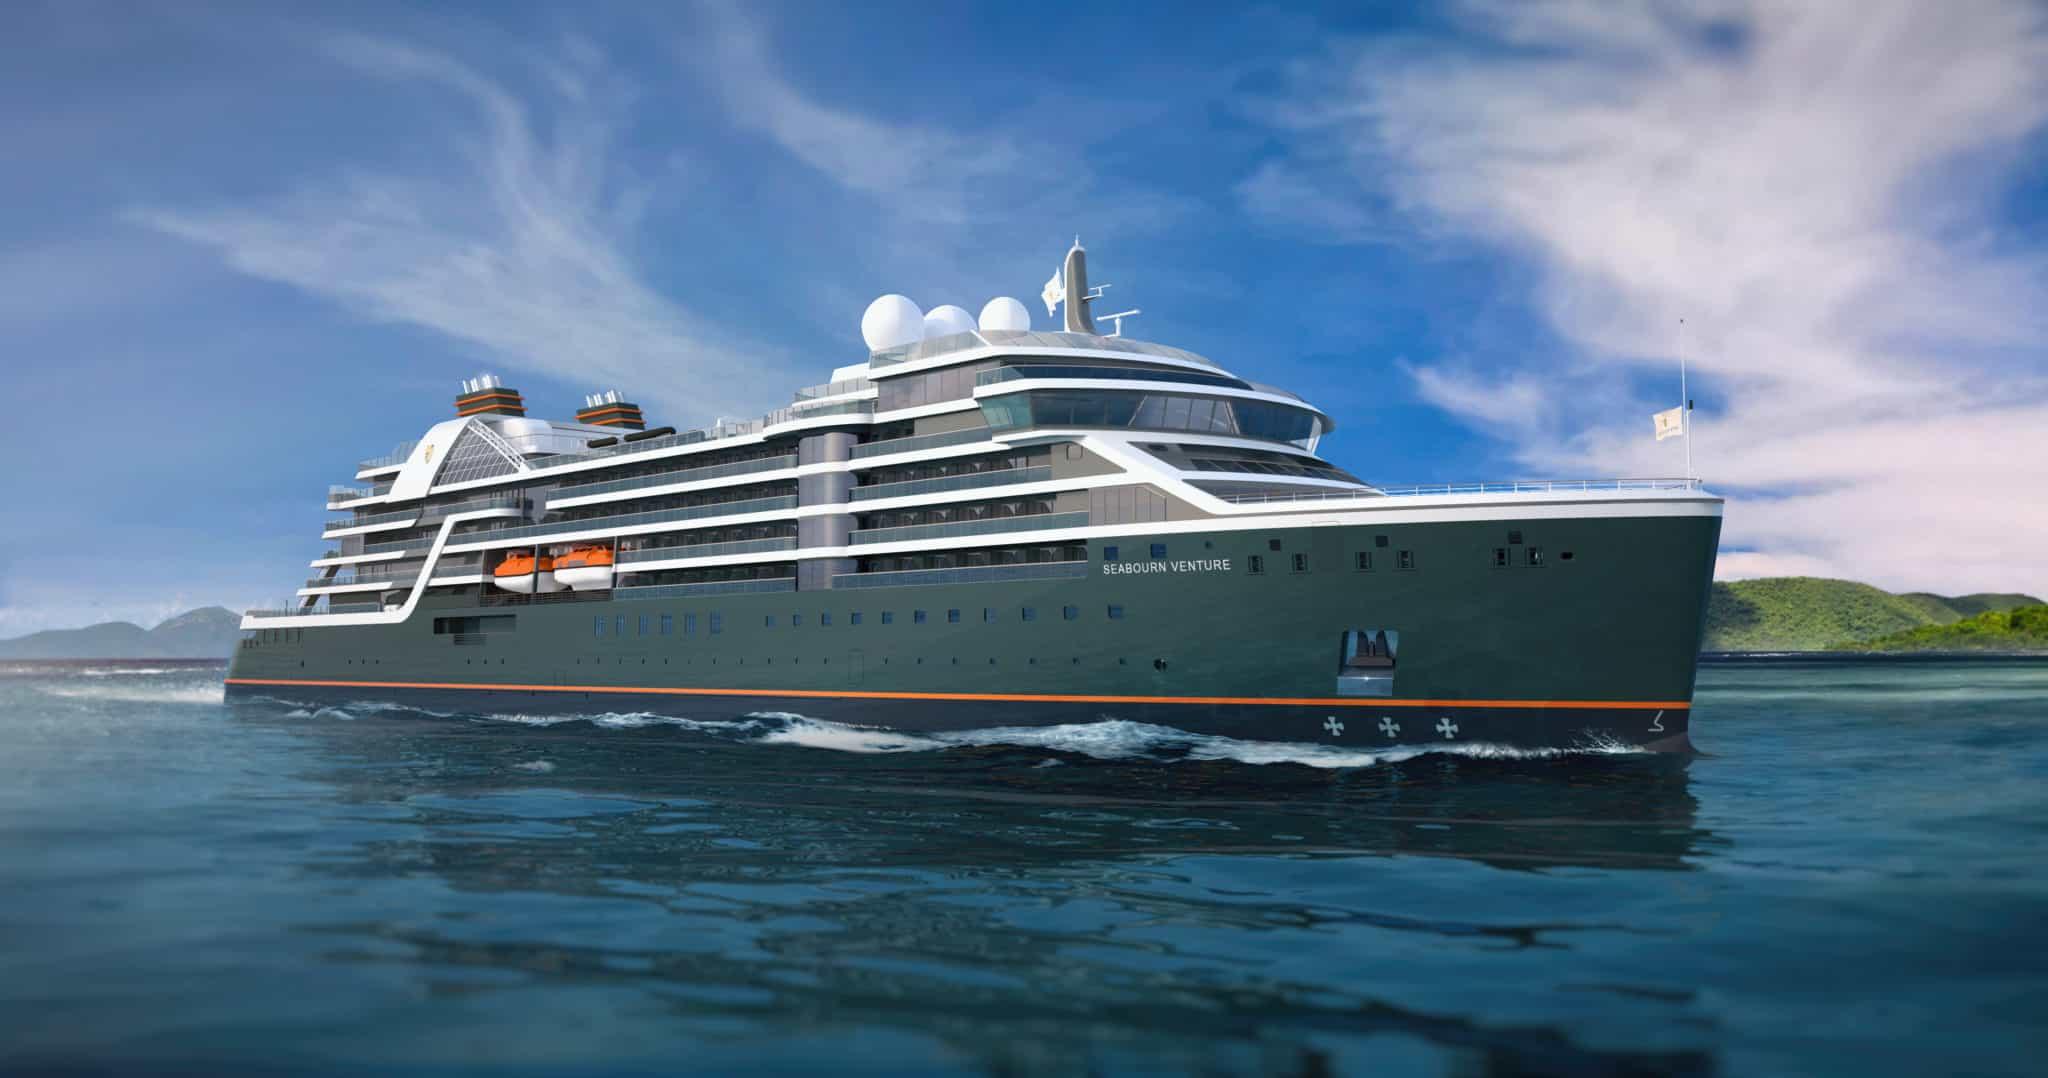 seabourn venture exterior rendering